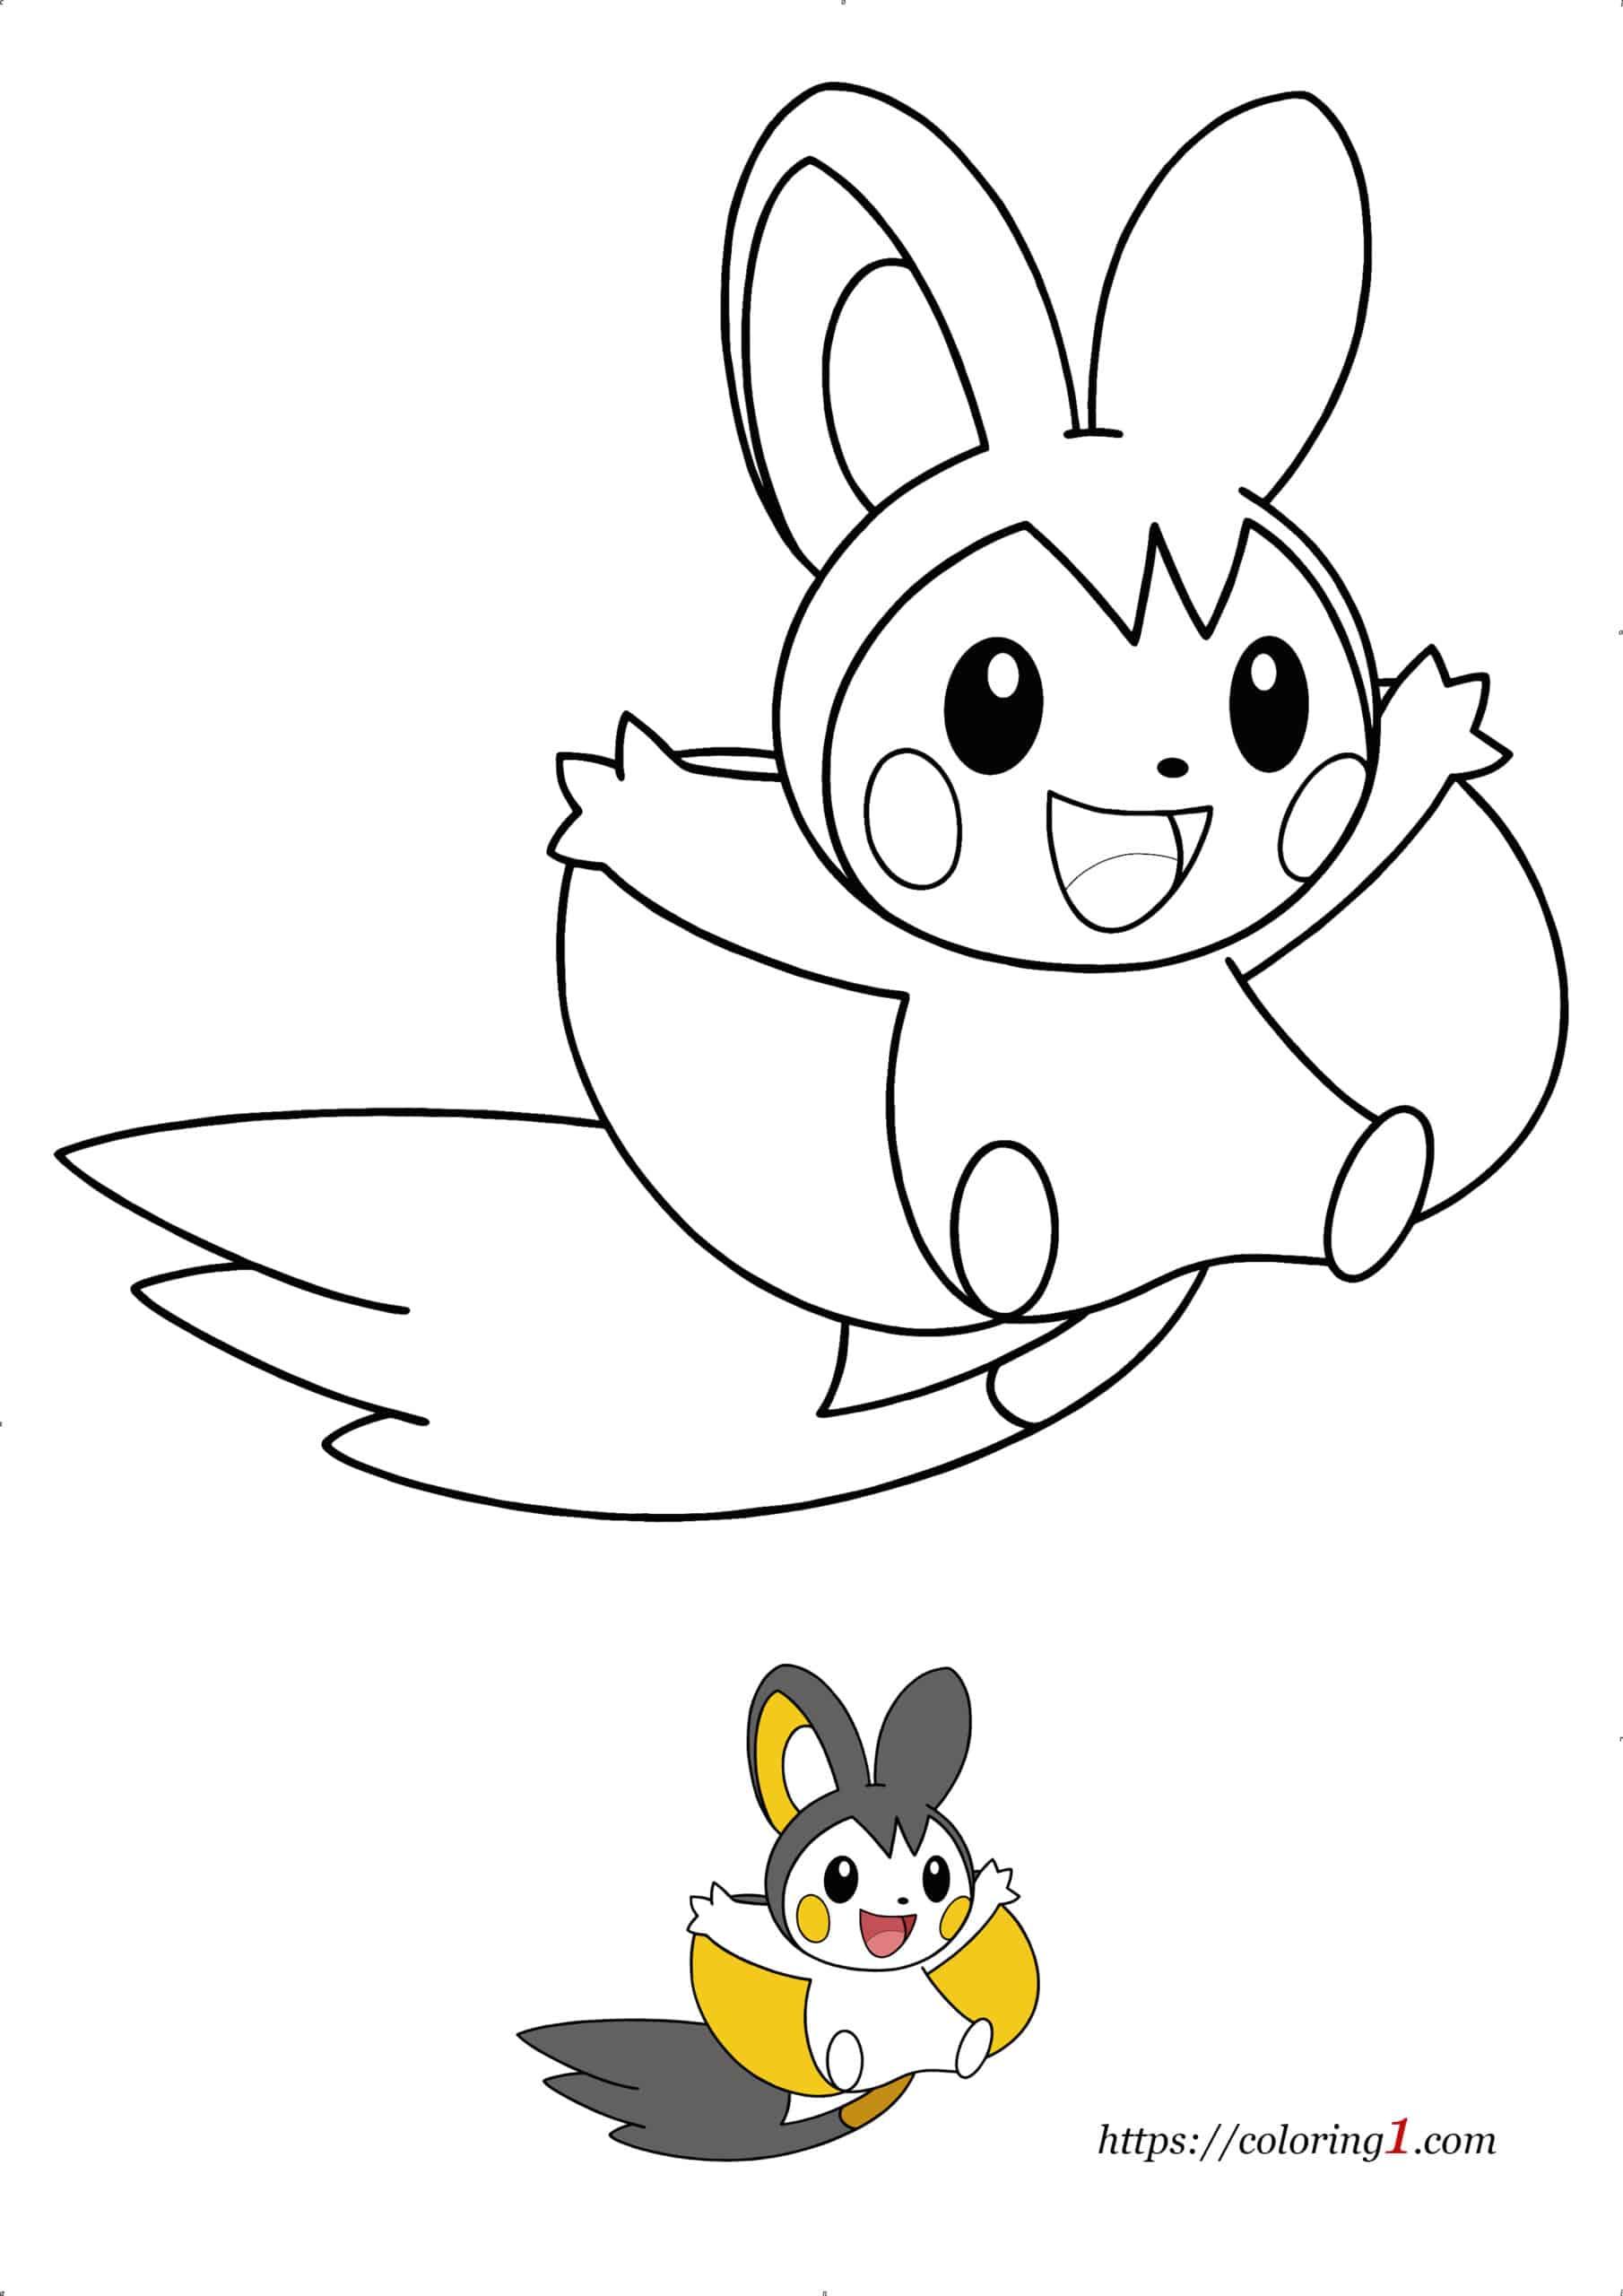 Coloriage Dessin Facile Pokemon Emolga à imprimer gratuit